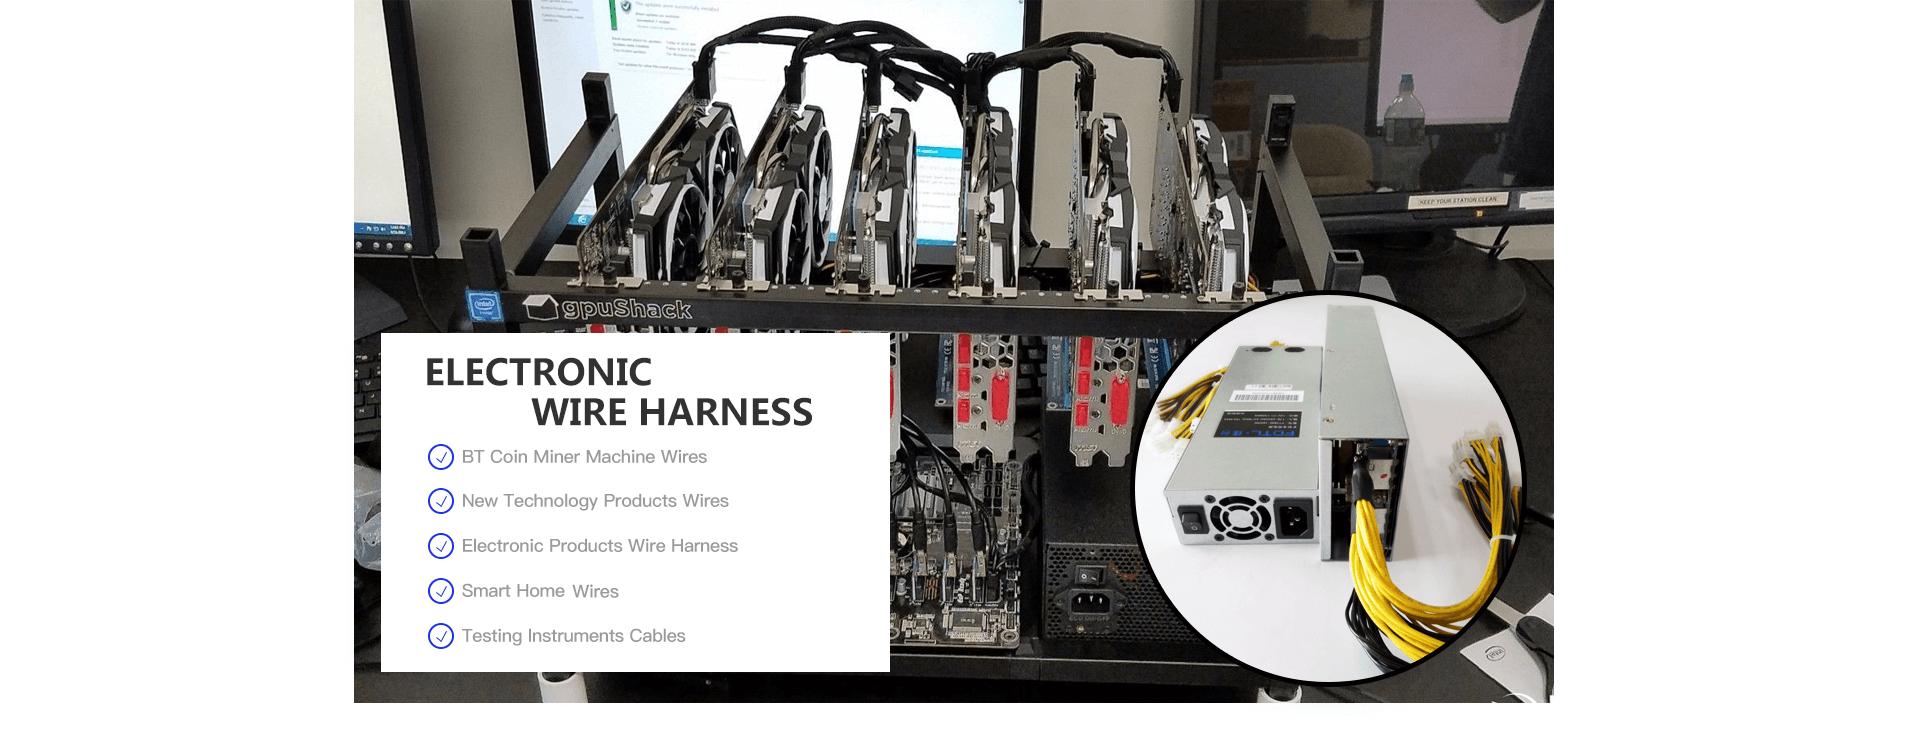 Wire Harness Machine Diagram For 2000 Oldsmobile Silhouette Wiring Testing Equipment Dongguan Aichie Tech Electronics Co Ltd Automotive Htb1zylbd25tbunjsspc762ngfxaw Aichieenalibabacom